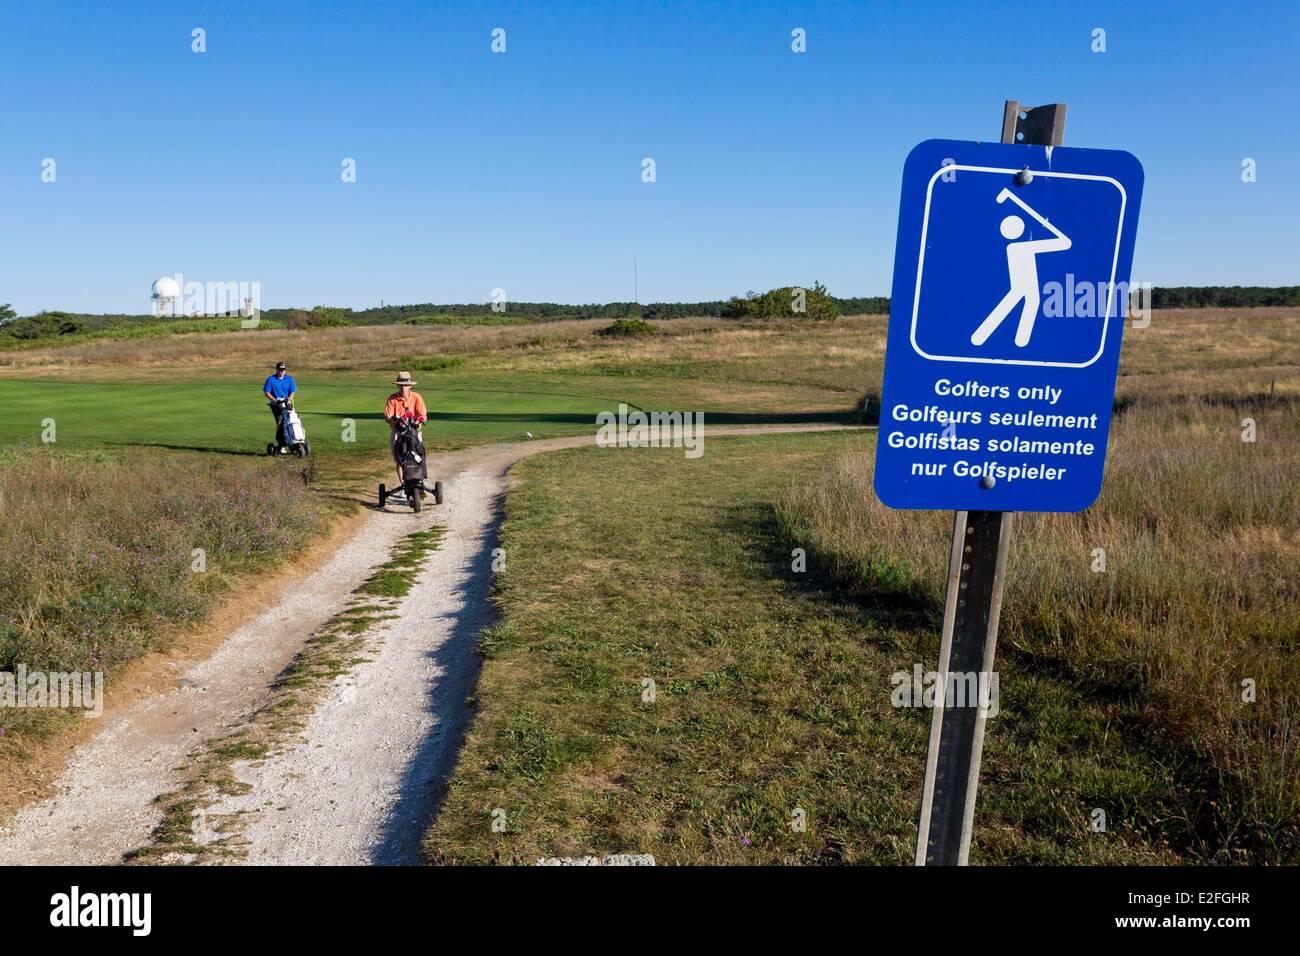 United States, Massachusetts, Cape Cod, Truro, Highland Lighthouse, golf course - Stock Image